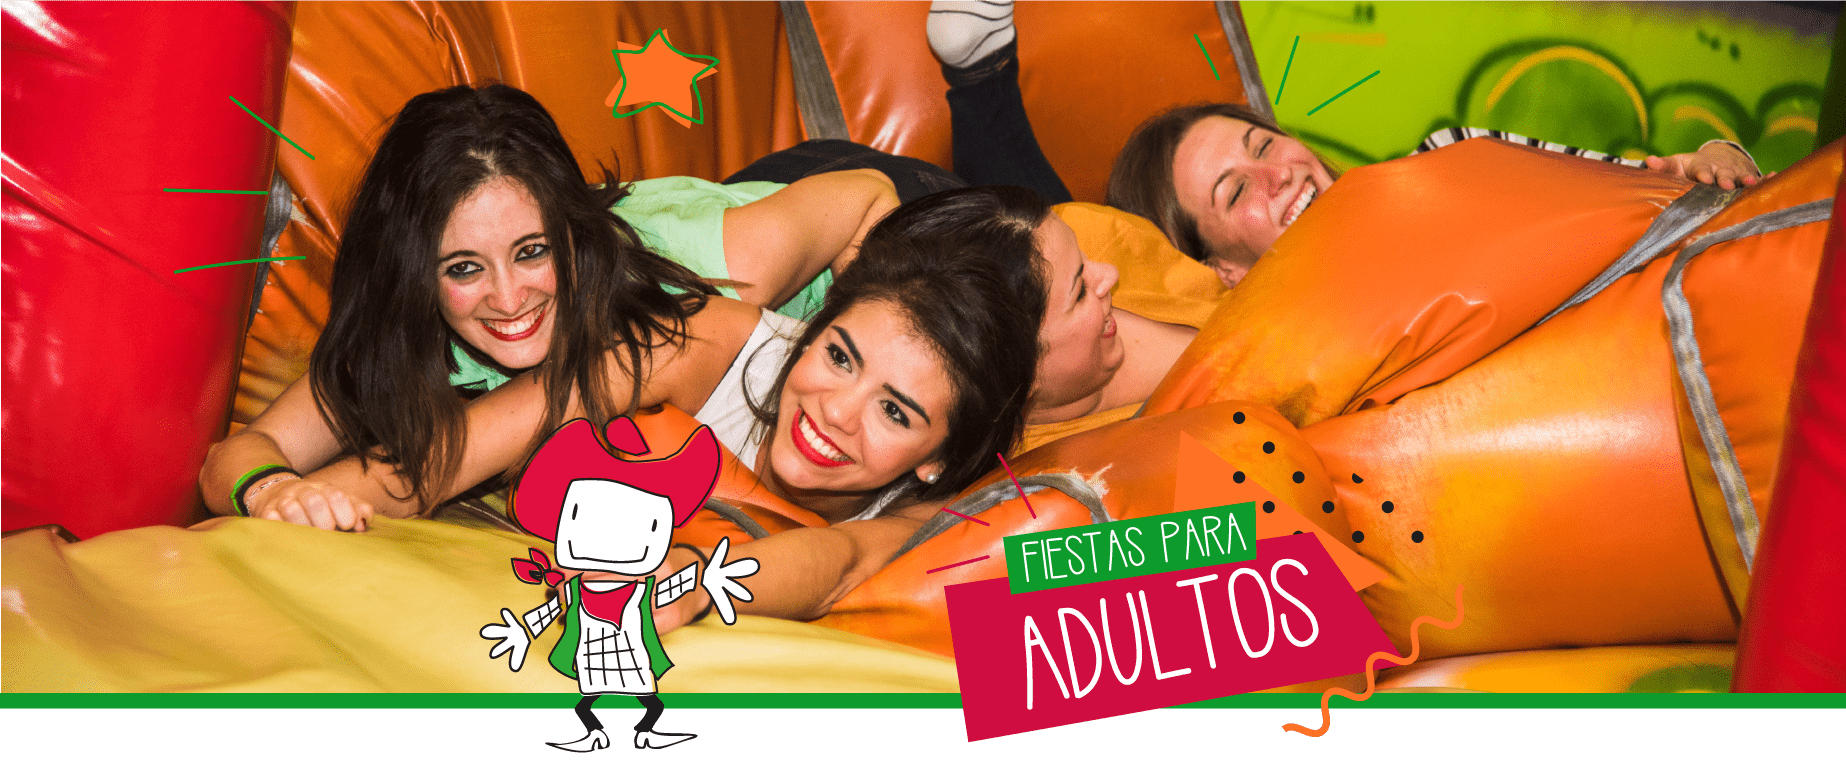 chiquipark con fiesta de adultos Barcelona